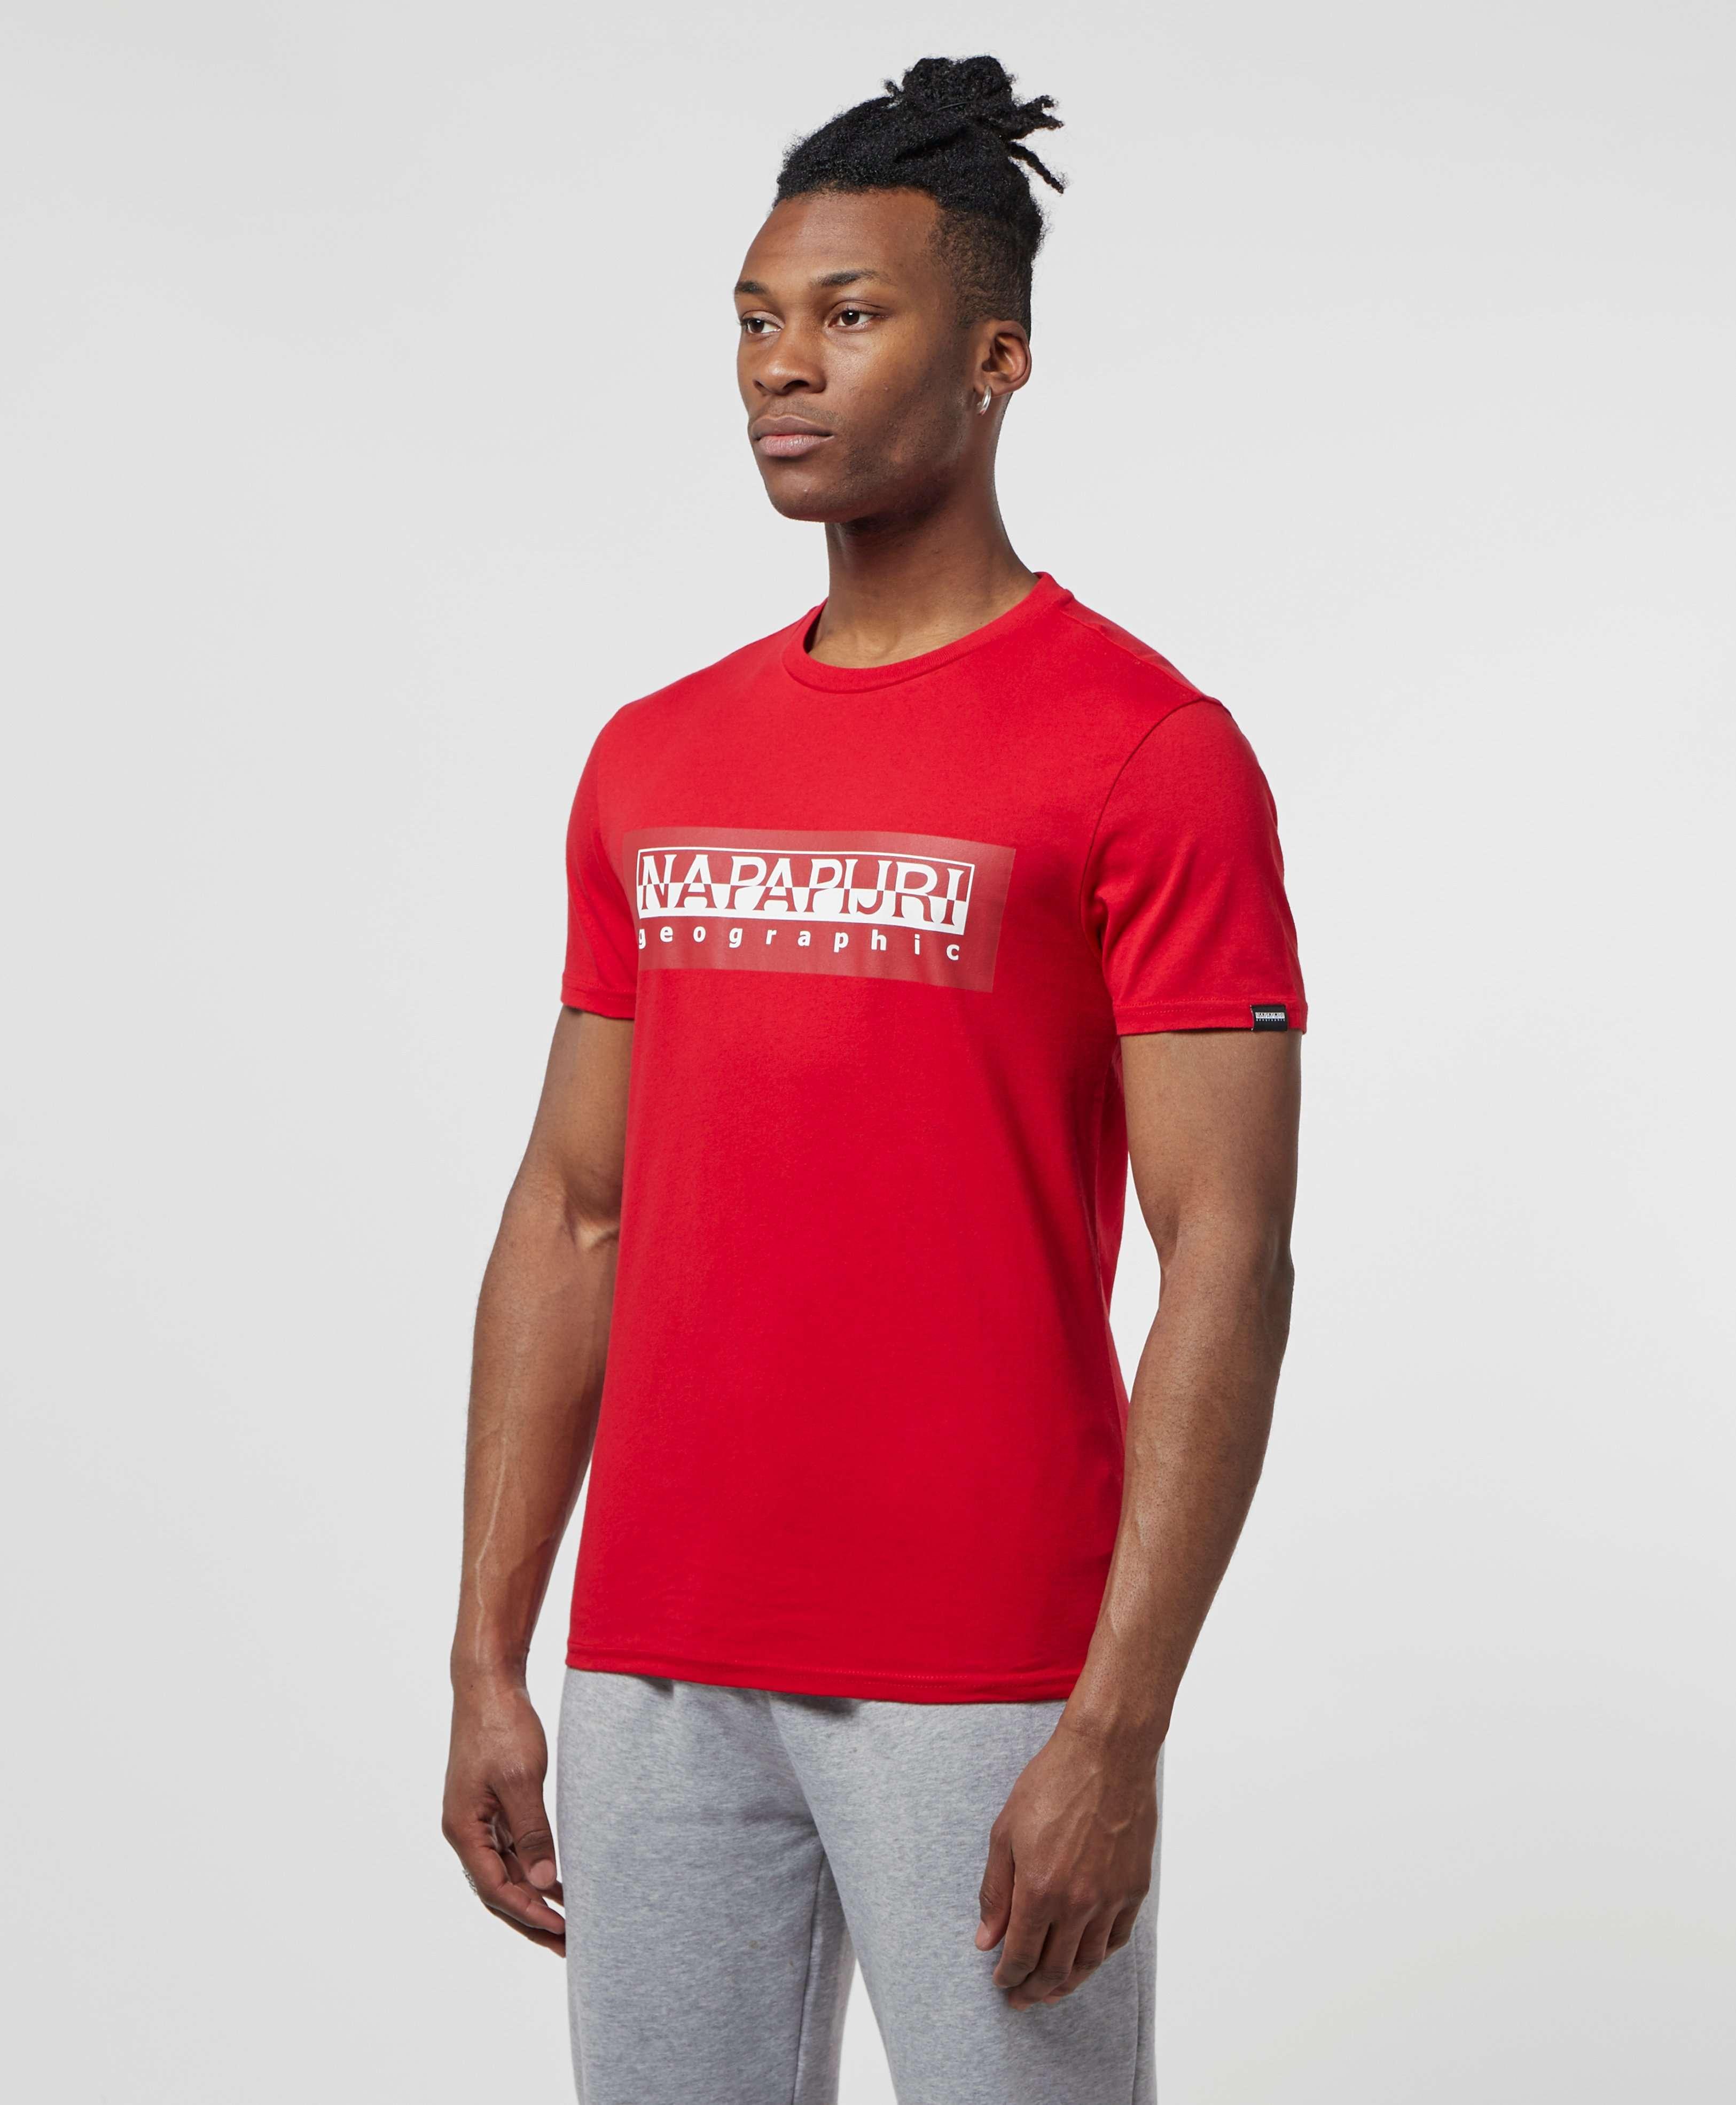 Napapijri Tribe Logo Short Sleeve T-Shirt